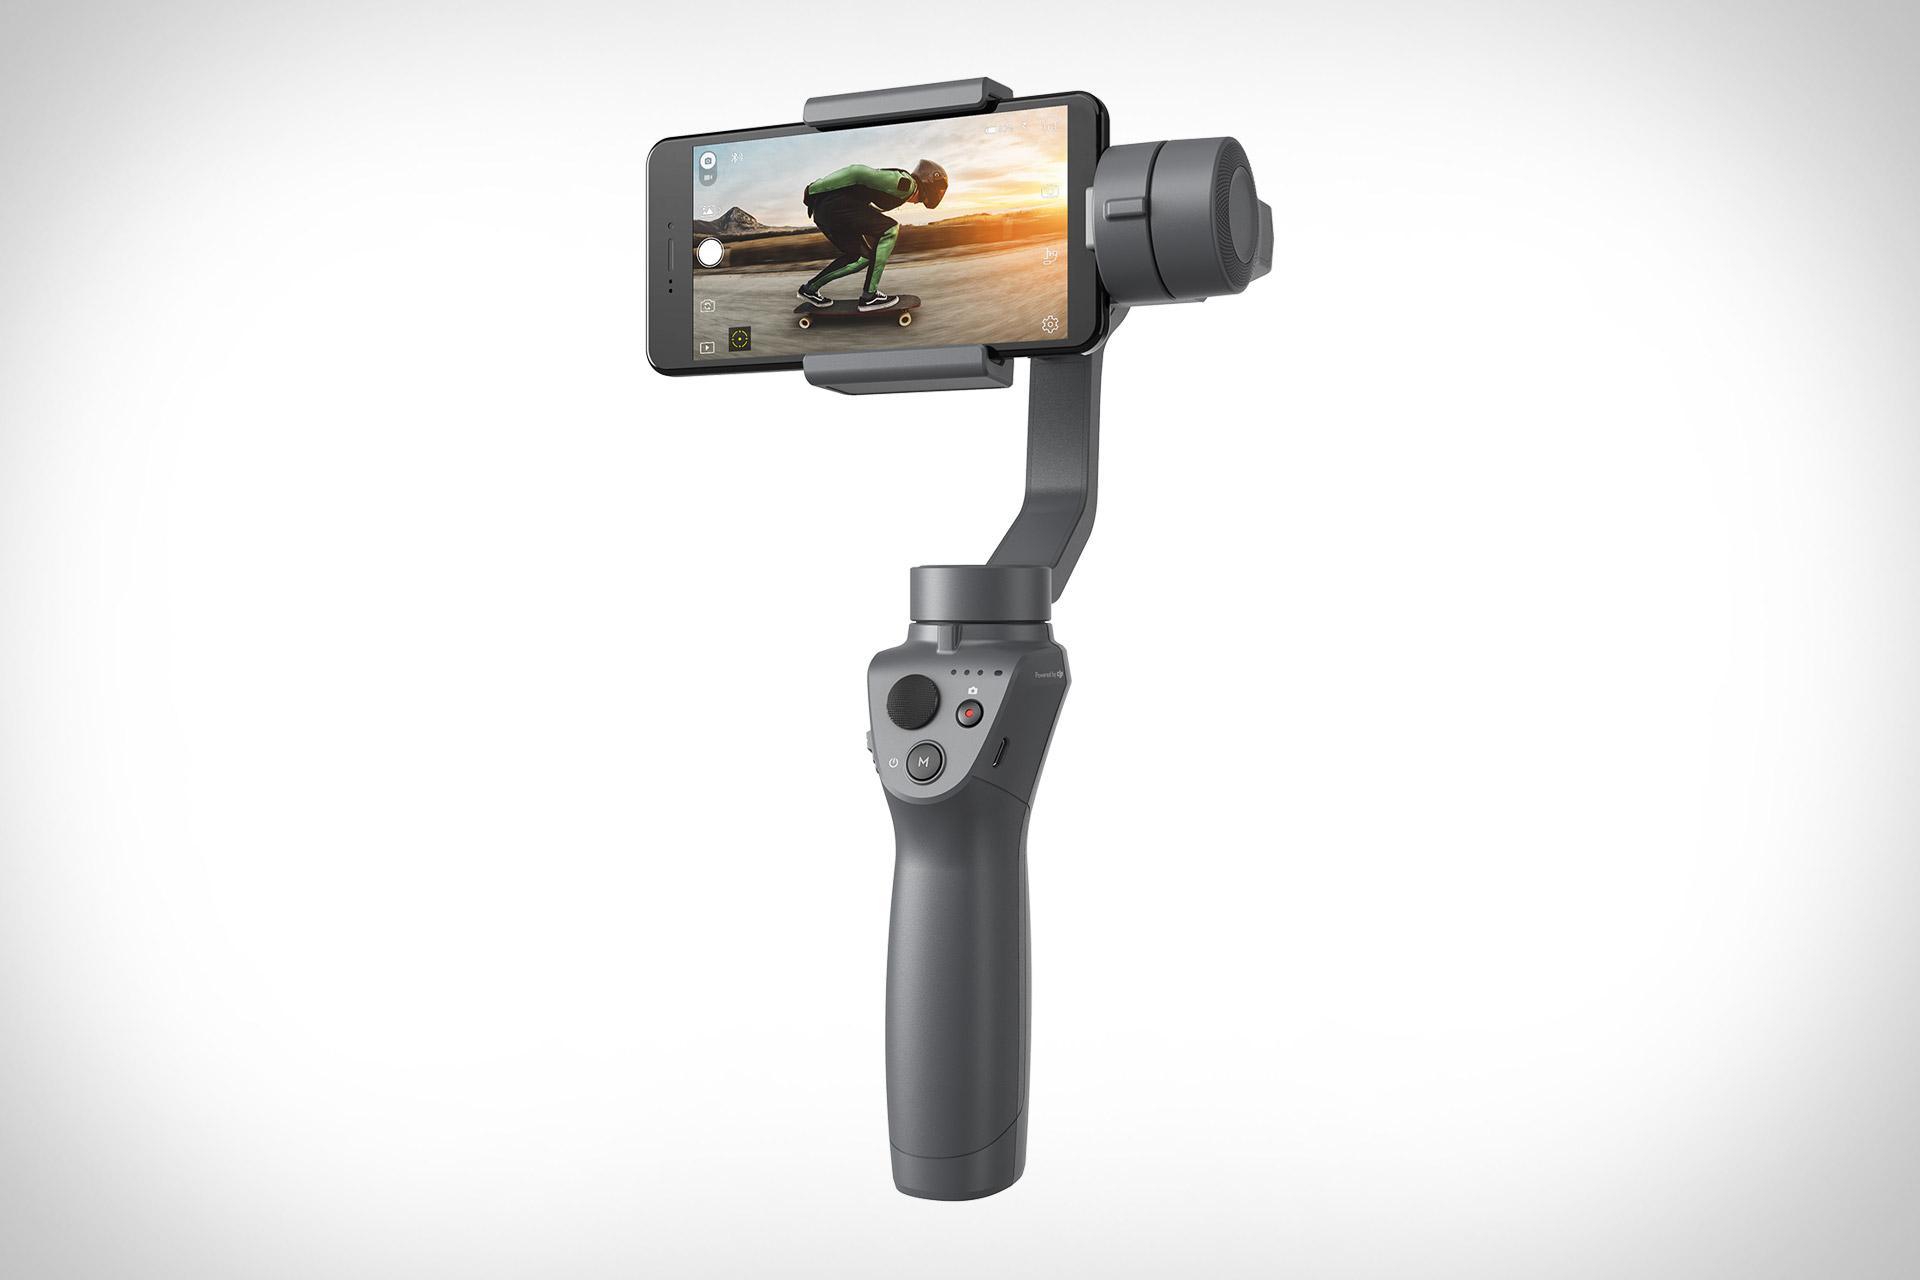 DJI Osmo Mobile 2 Stabilizer